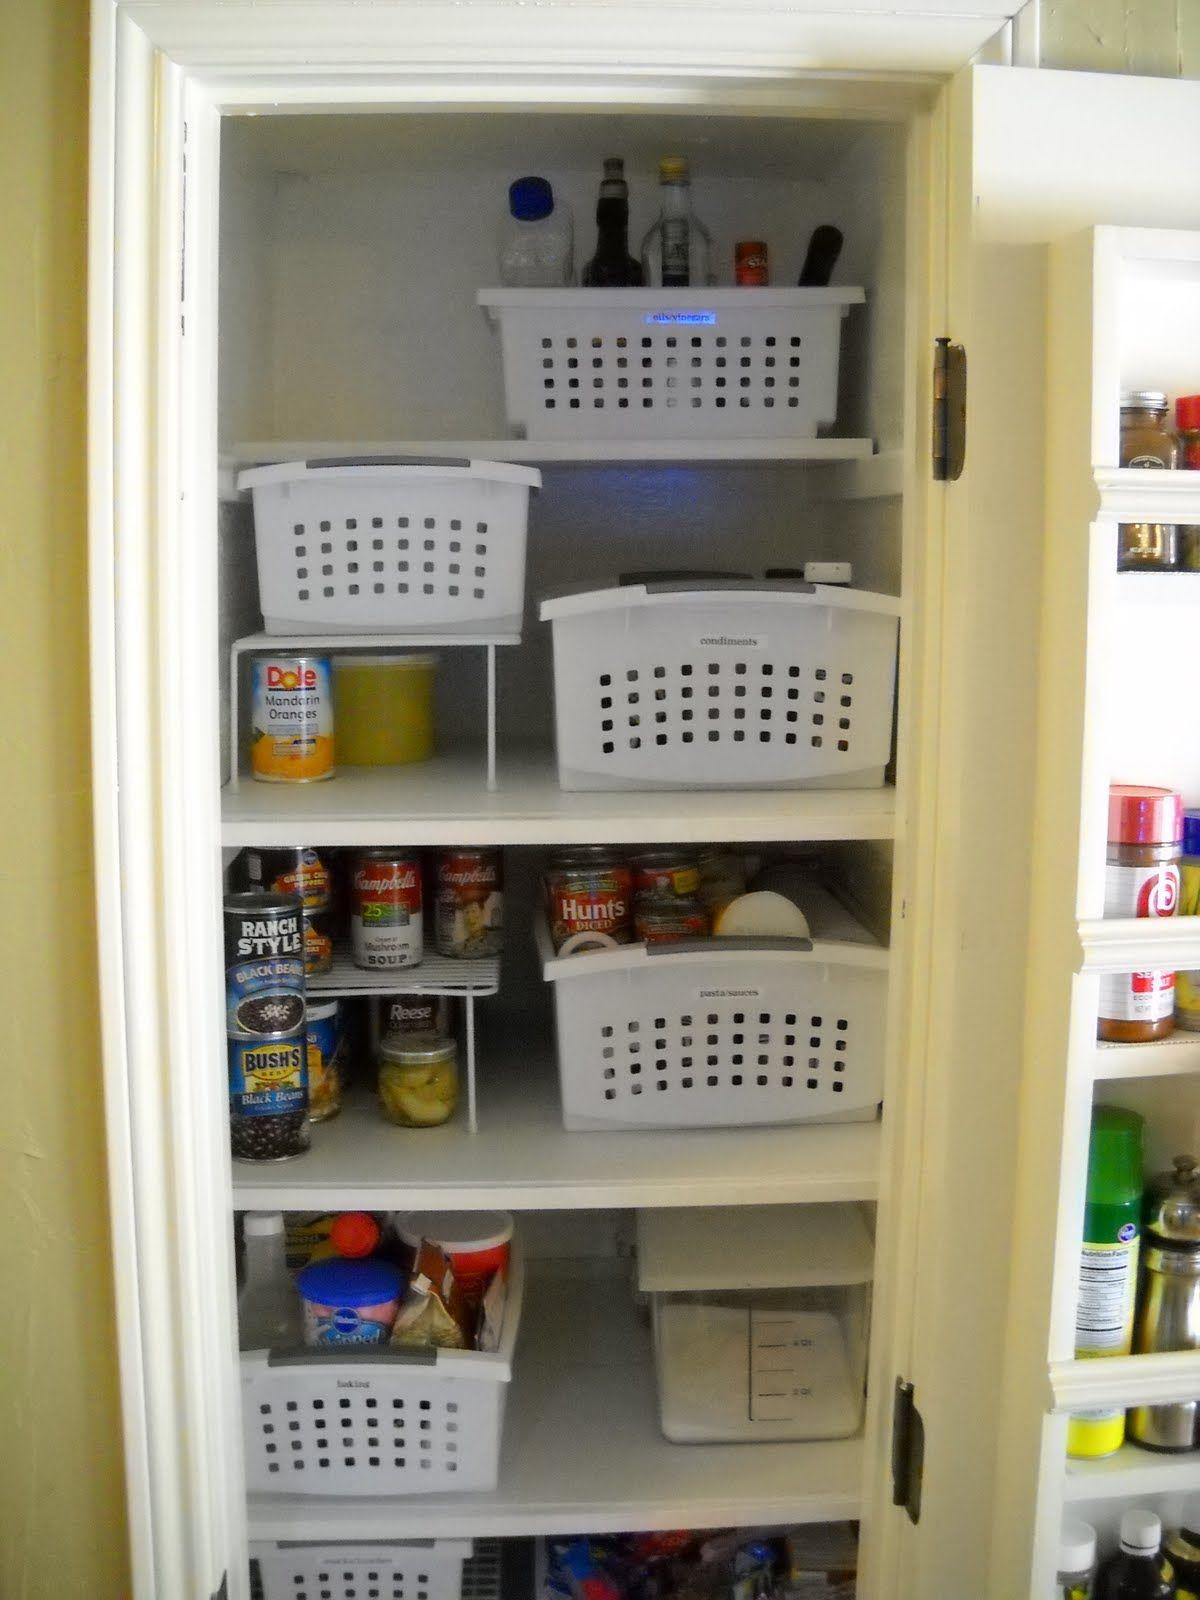 My Newly Organized Pantry Thanks Iheartorganizing For The Inspiration Old Mother Hubbard Pantry Organization Locker Storage